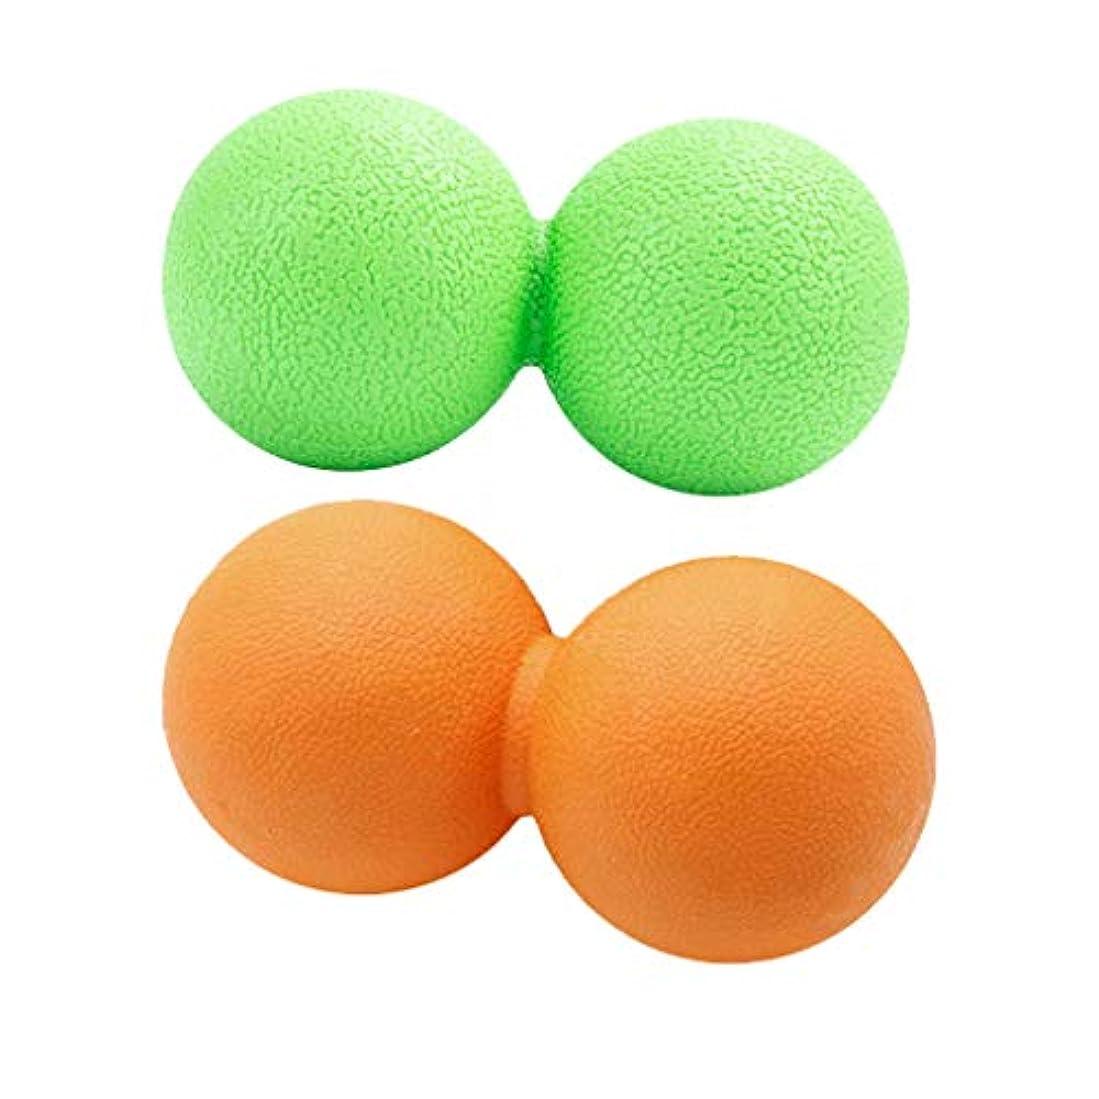 F Fityle マッサージボール ピーナッツ型 筋膜リリース トリガーポイント 緊張緩和 健康グッズ 2個入